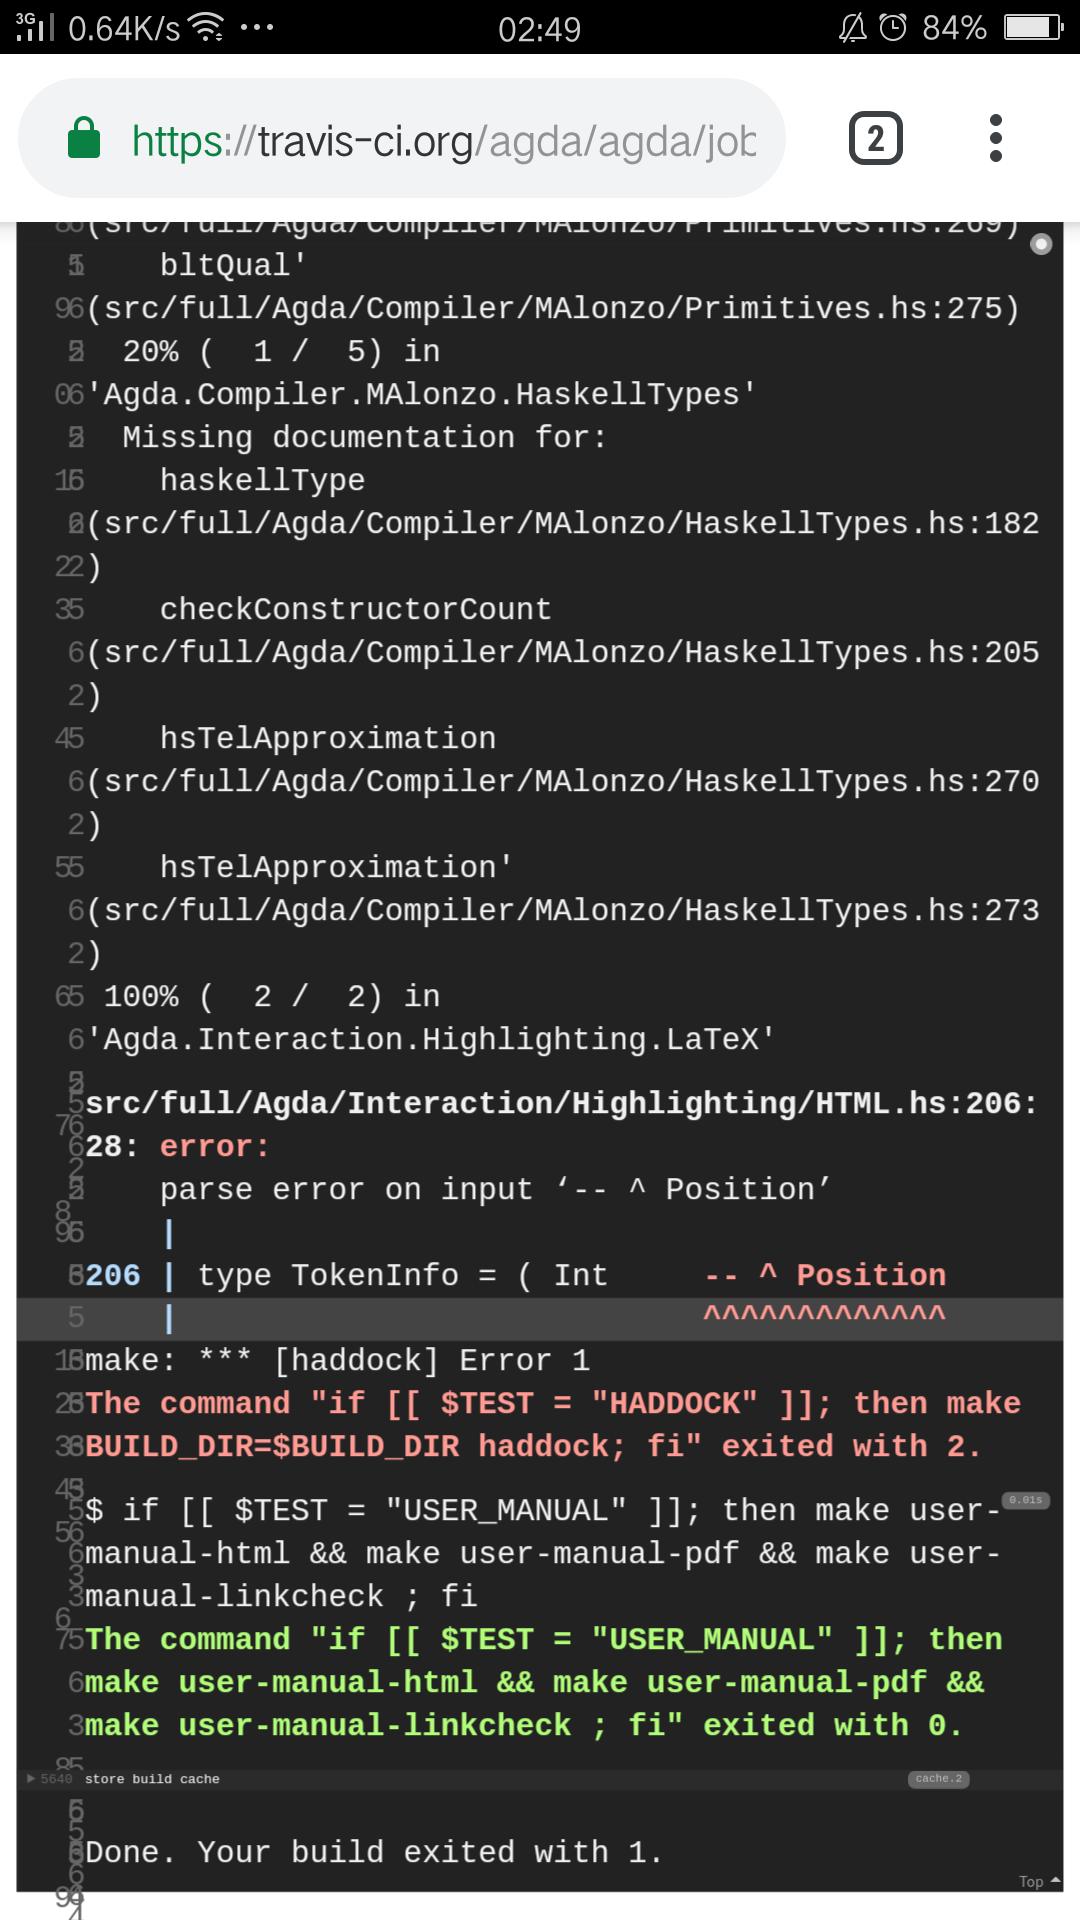 screenshot_2018-11-13-02-49-59-78